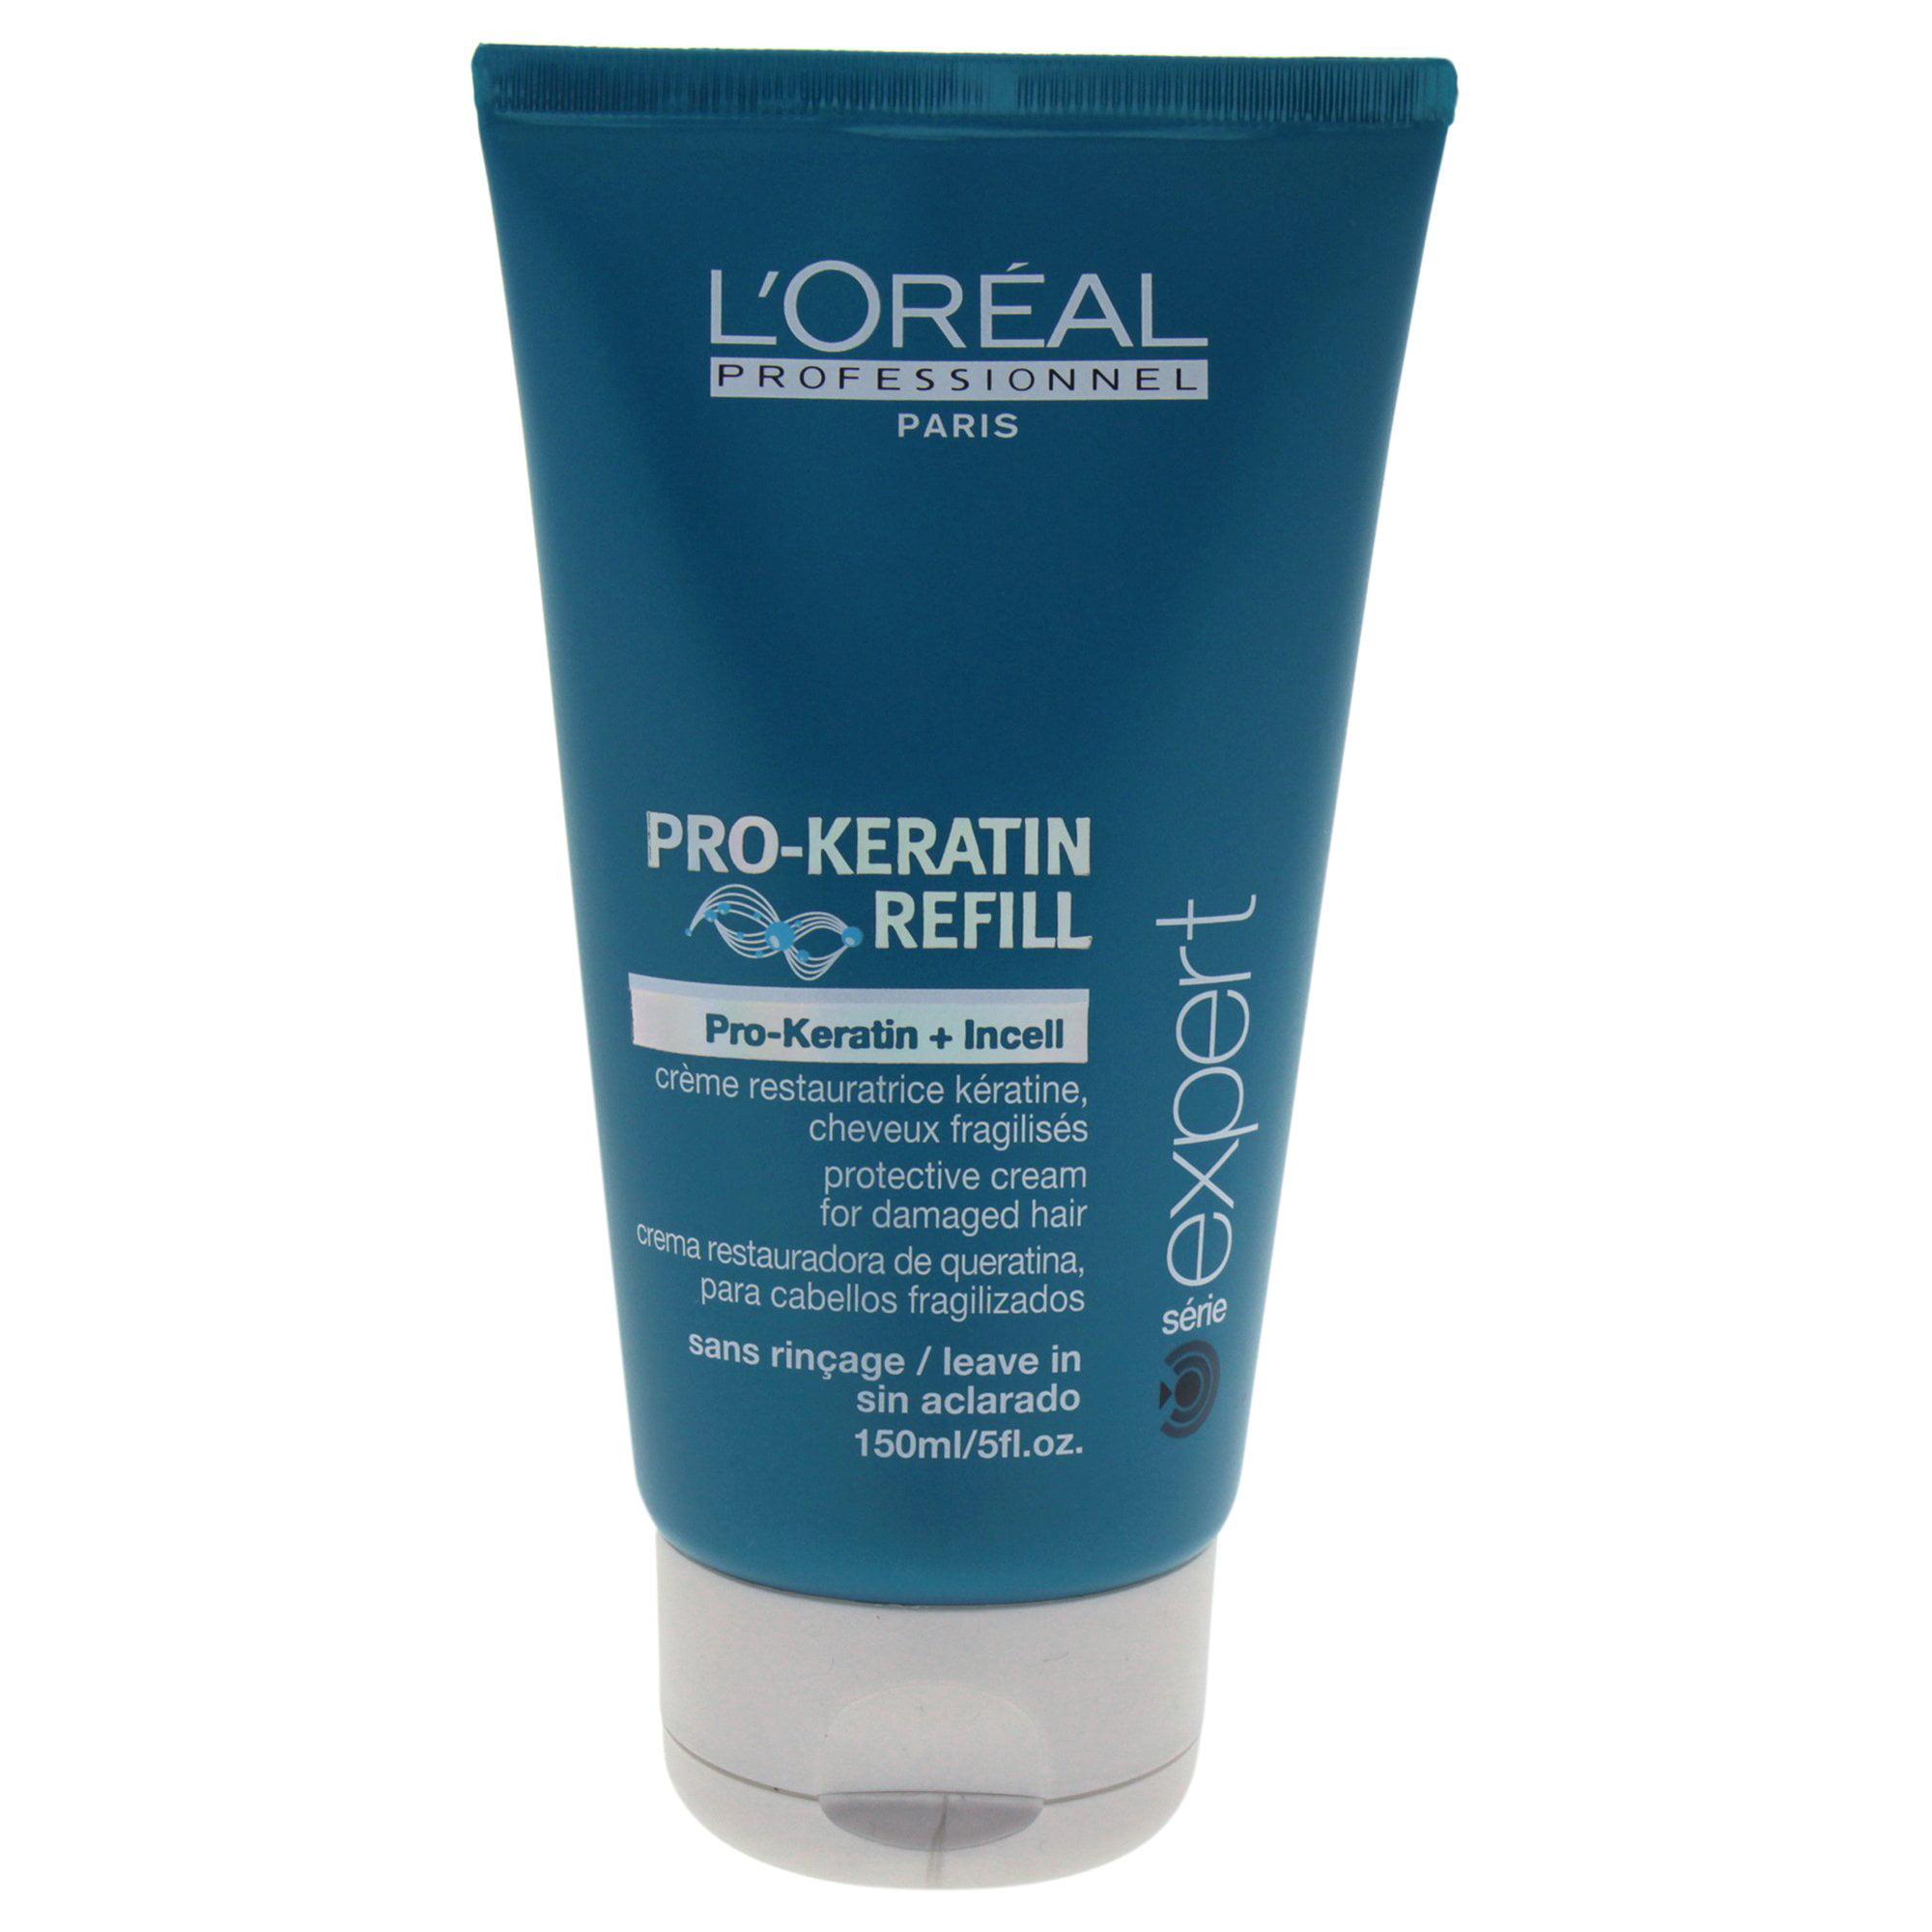 Loreal Pro-Keratin Refill Cream 5 Oz